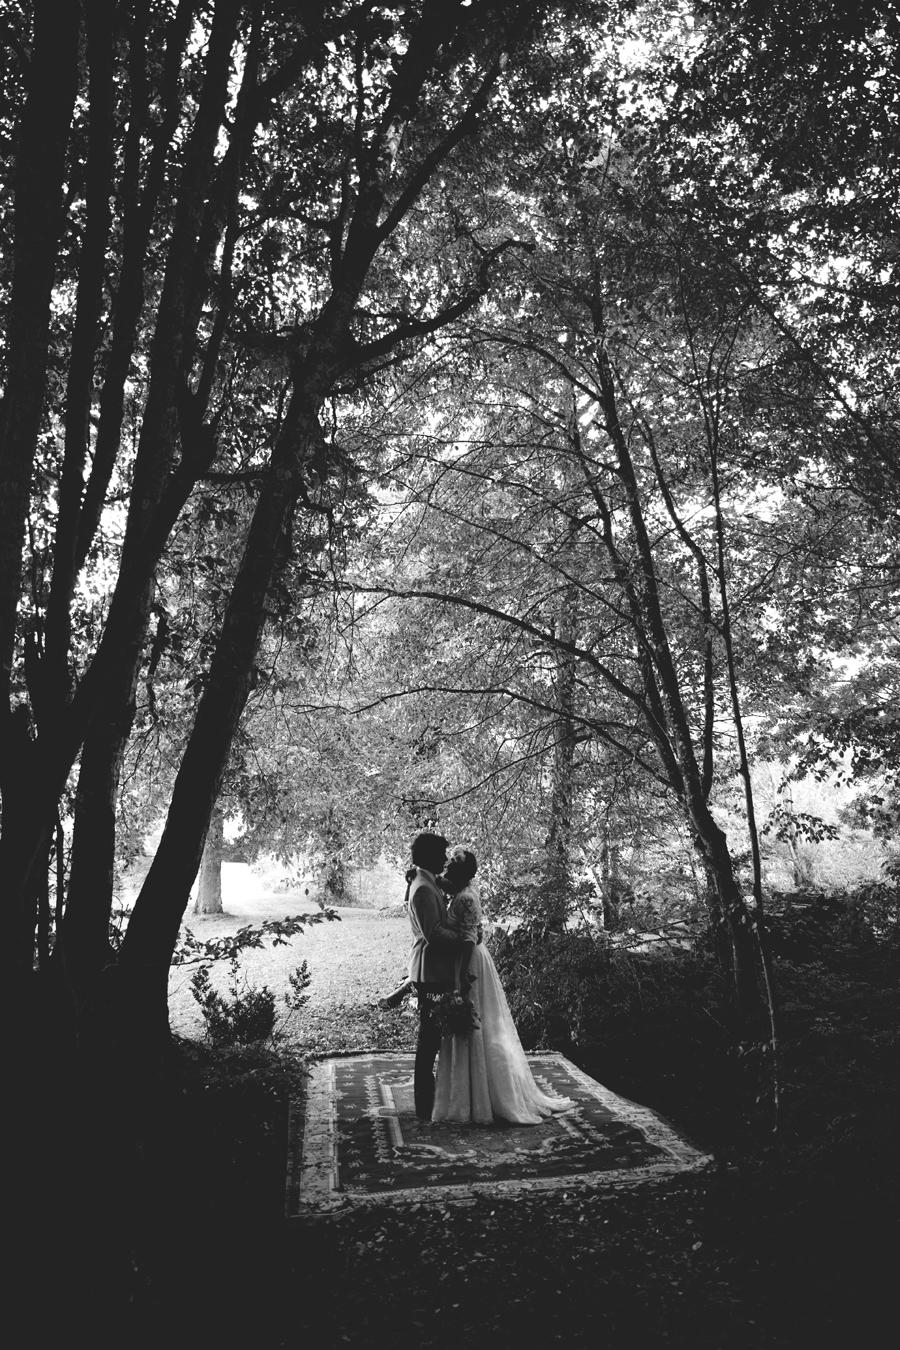 wedding_elise_et_martin_060